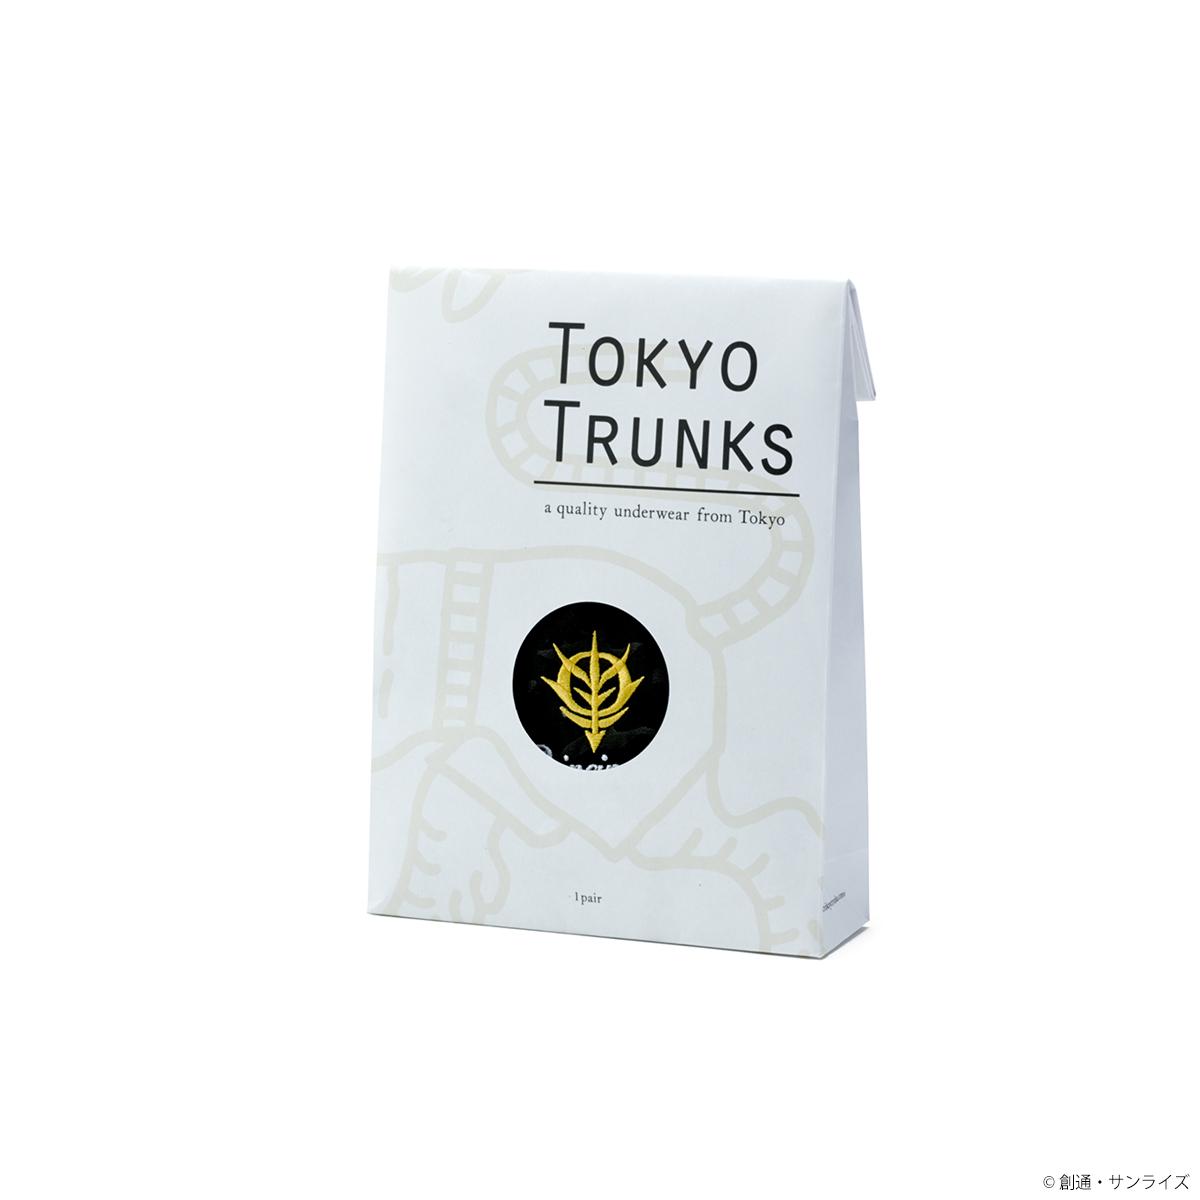 STRICT-G × TOKYO TRUNKS 『機動戦士ガンダム』トランクス ジオン軍カモフラージュ柄